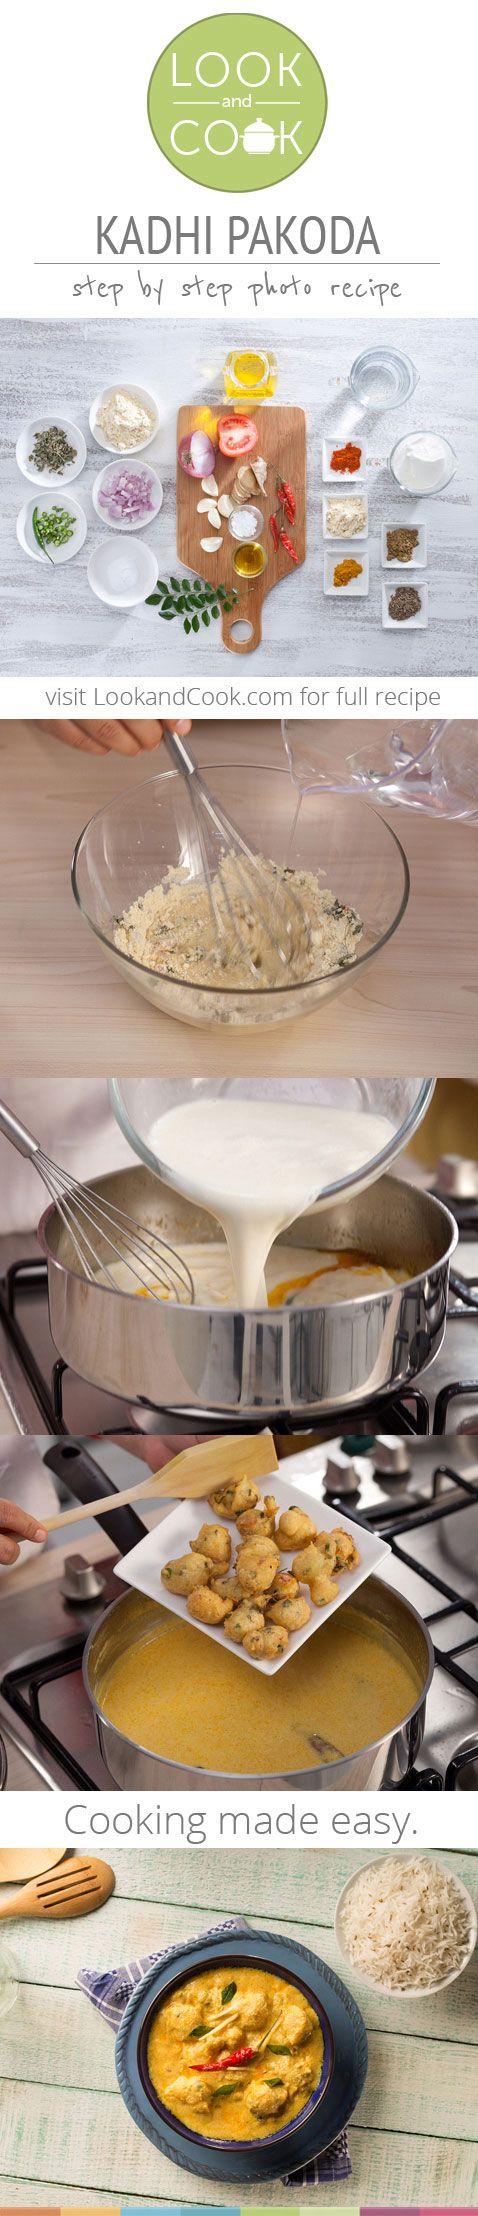 How to make kadhi pakora recipe pakora recipes yogurt and learning forumfinder Images